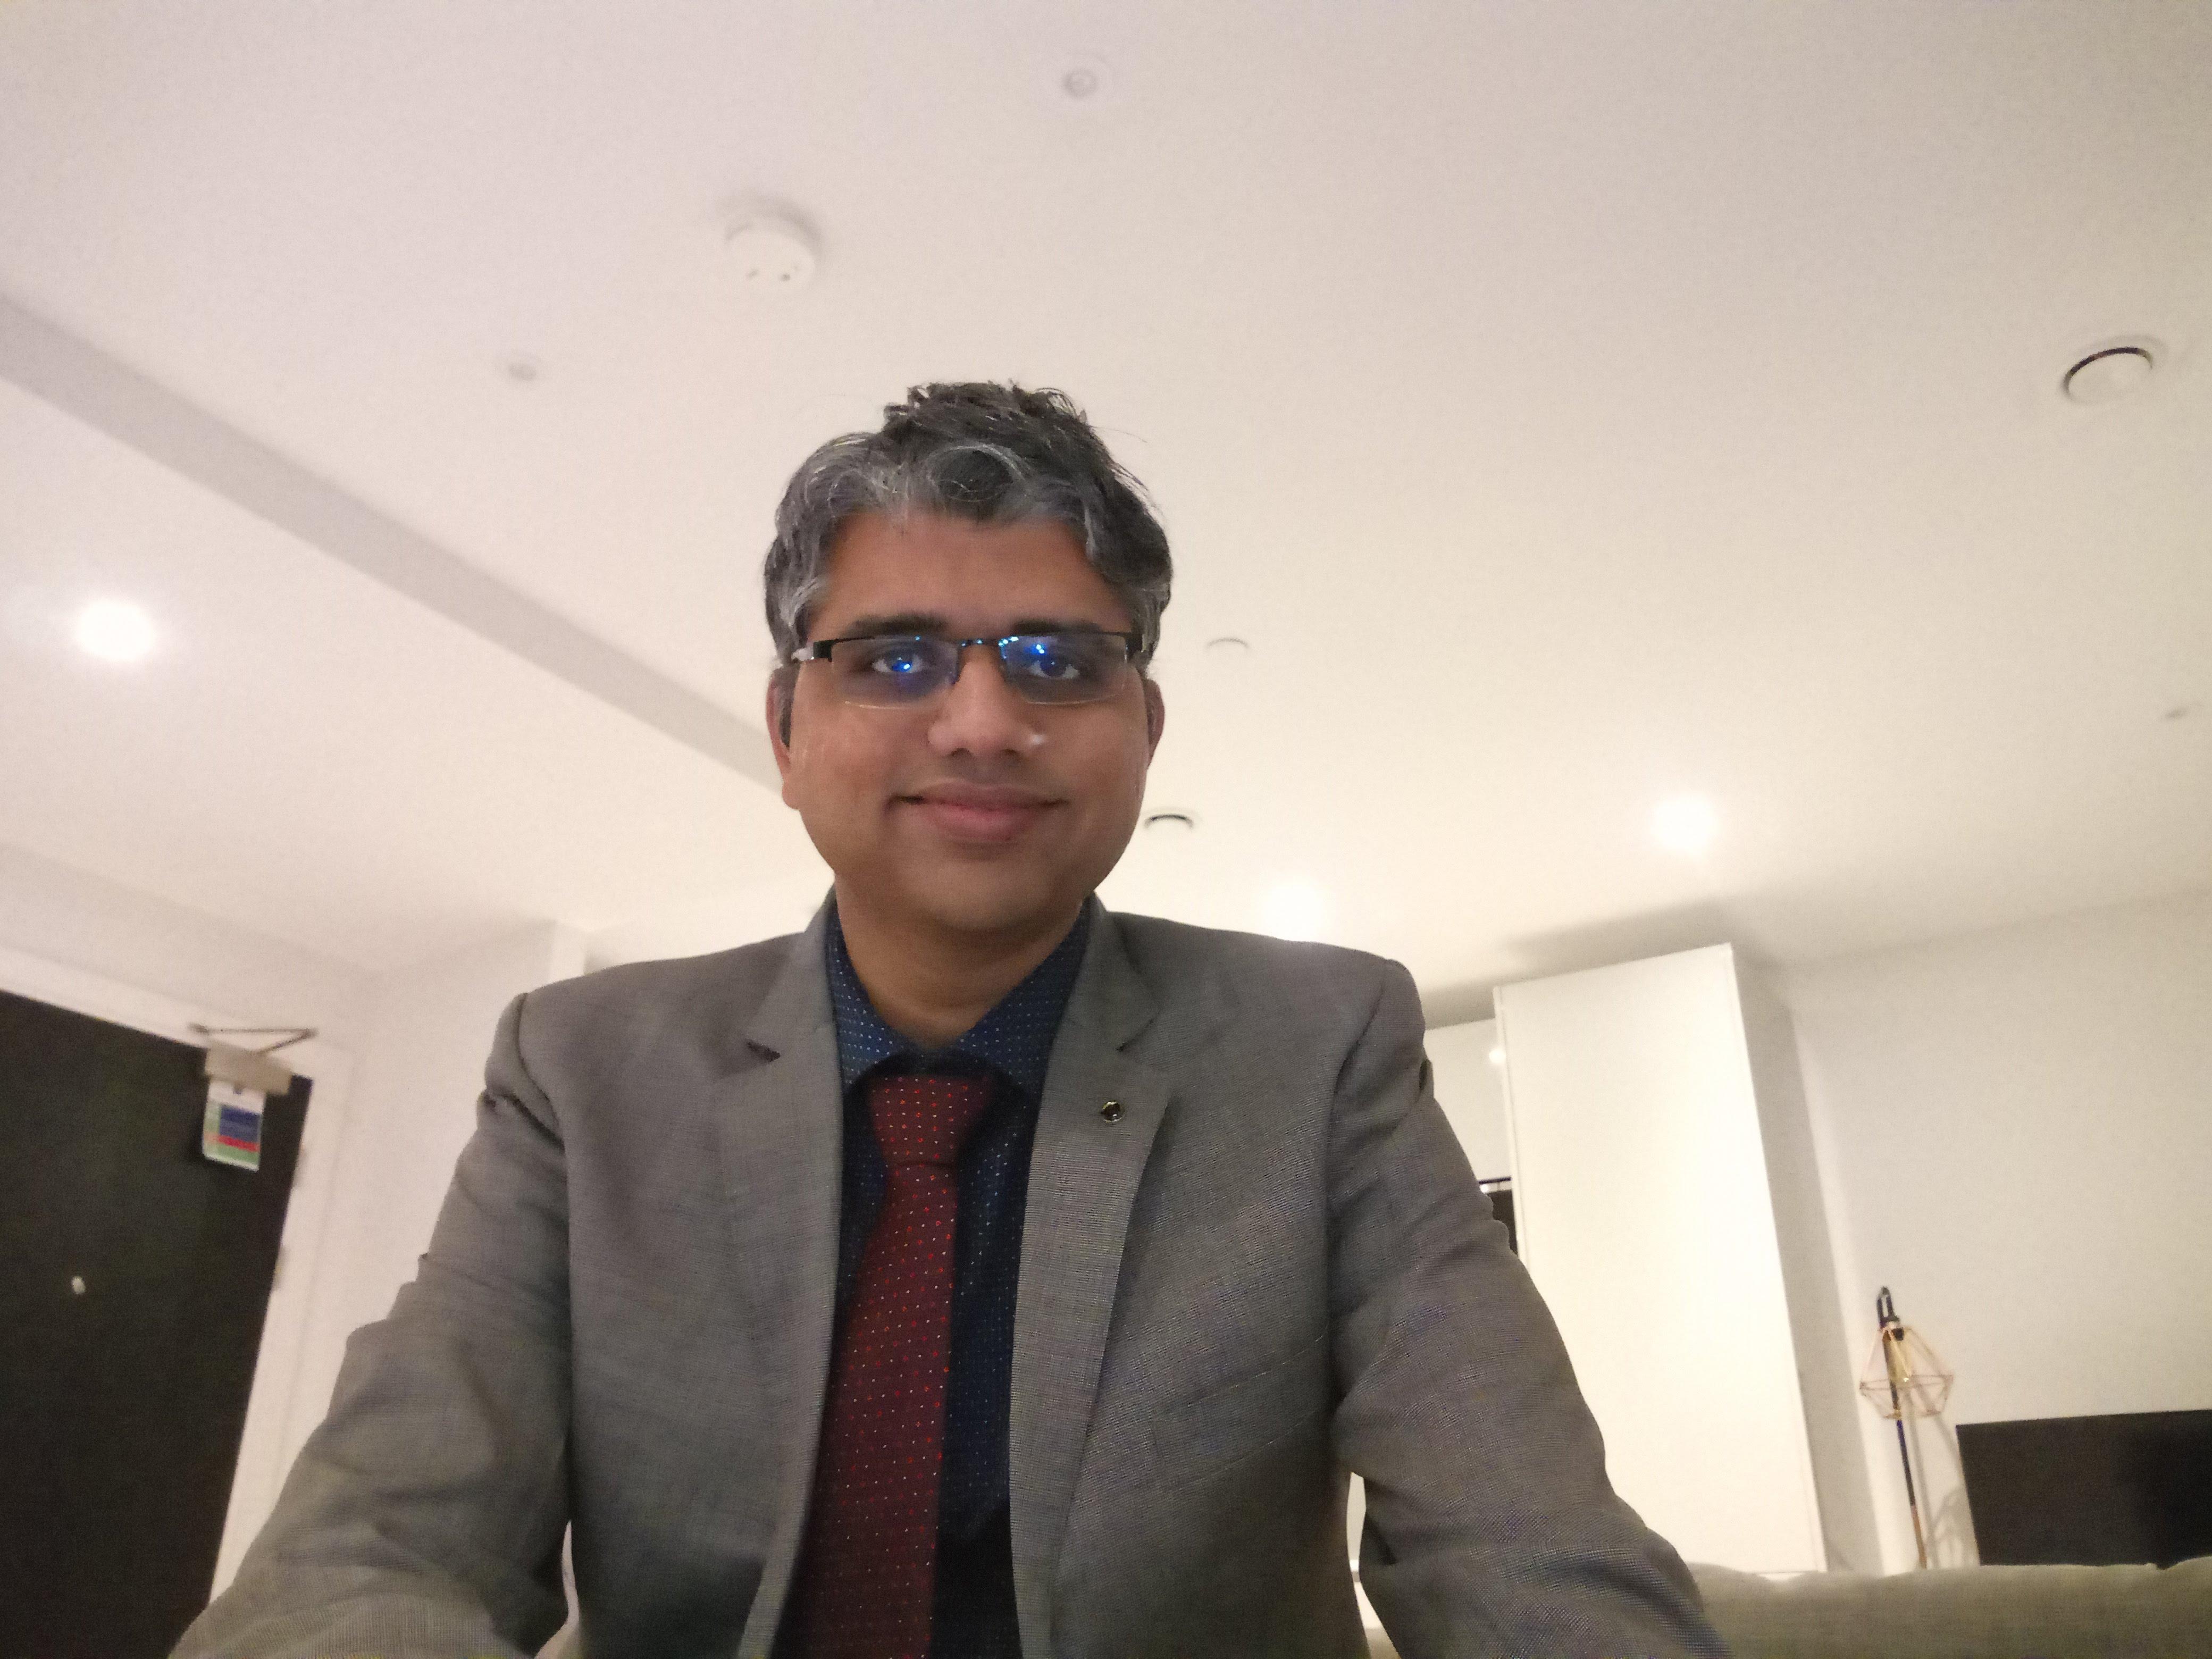 Badrinath Srinivasan